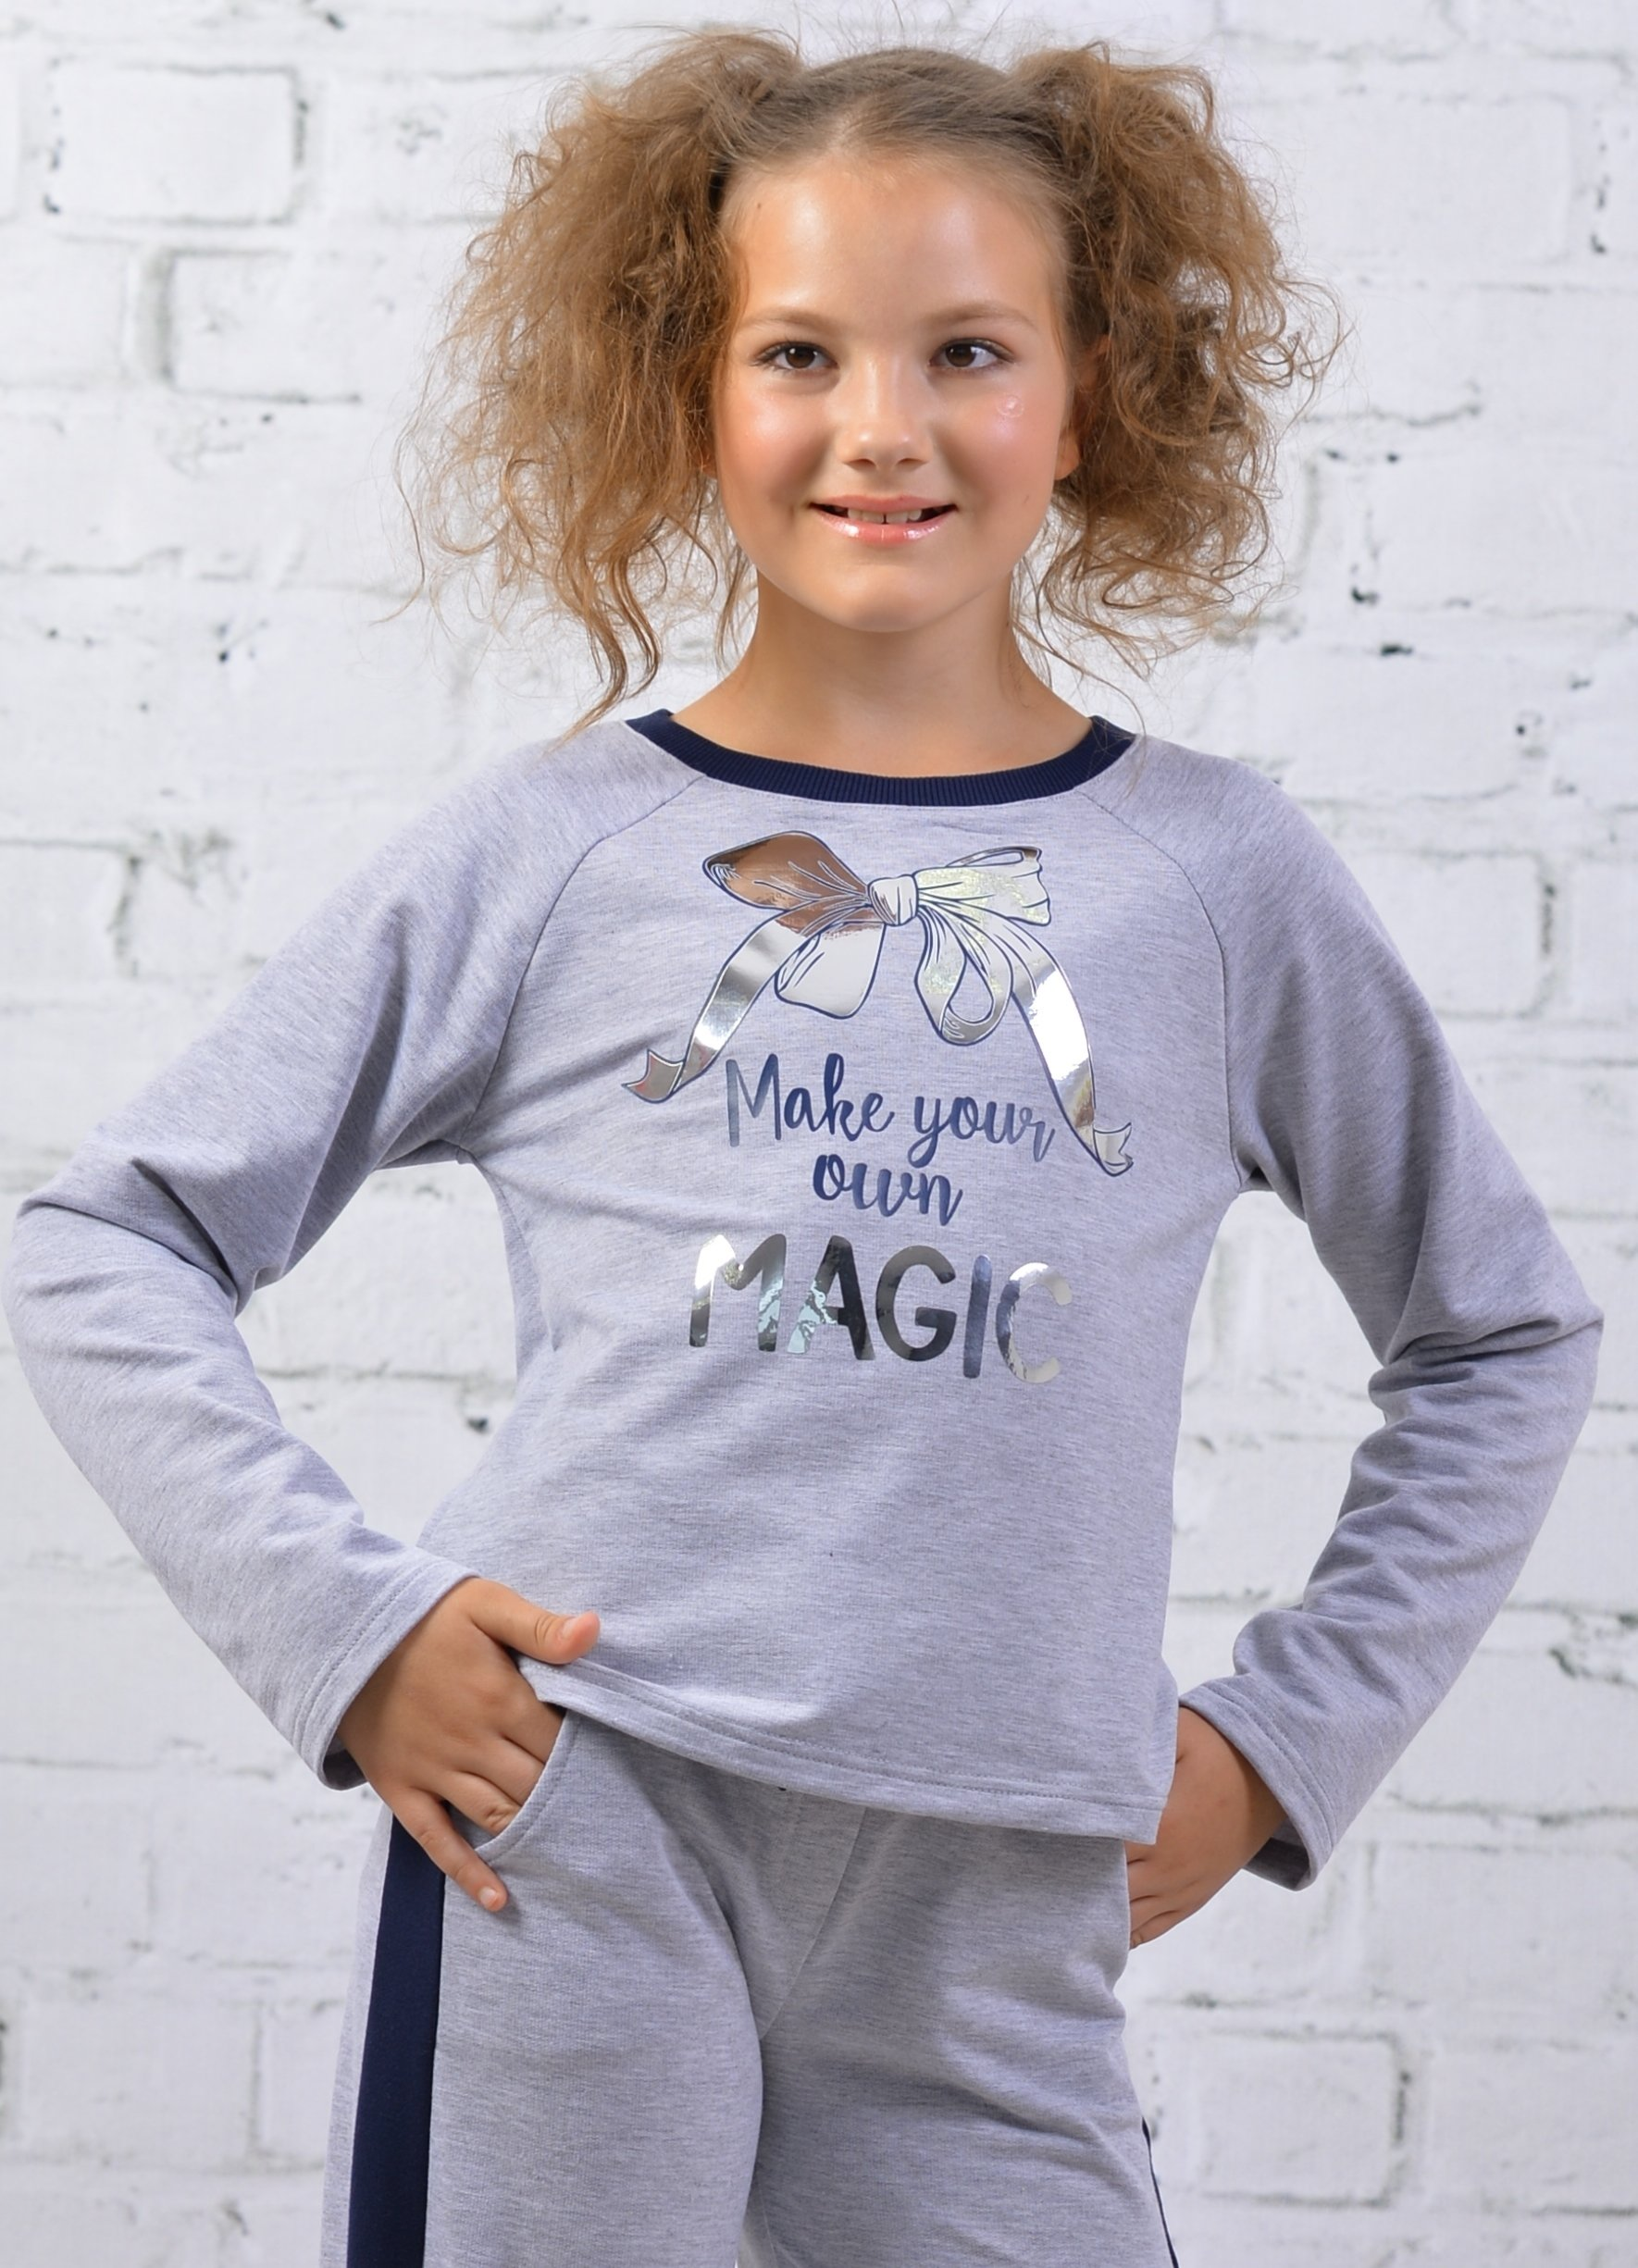 Джемпер для девочки DSDT113A